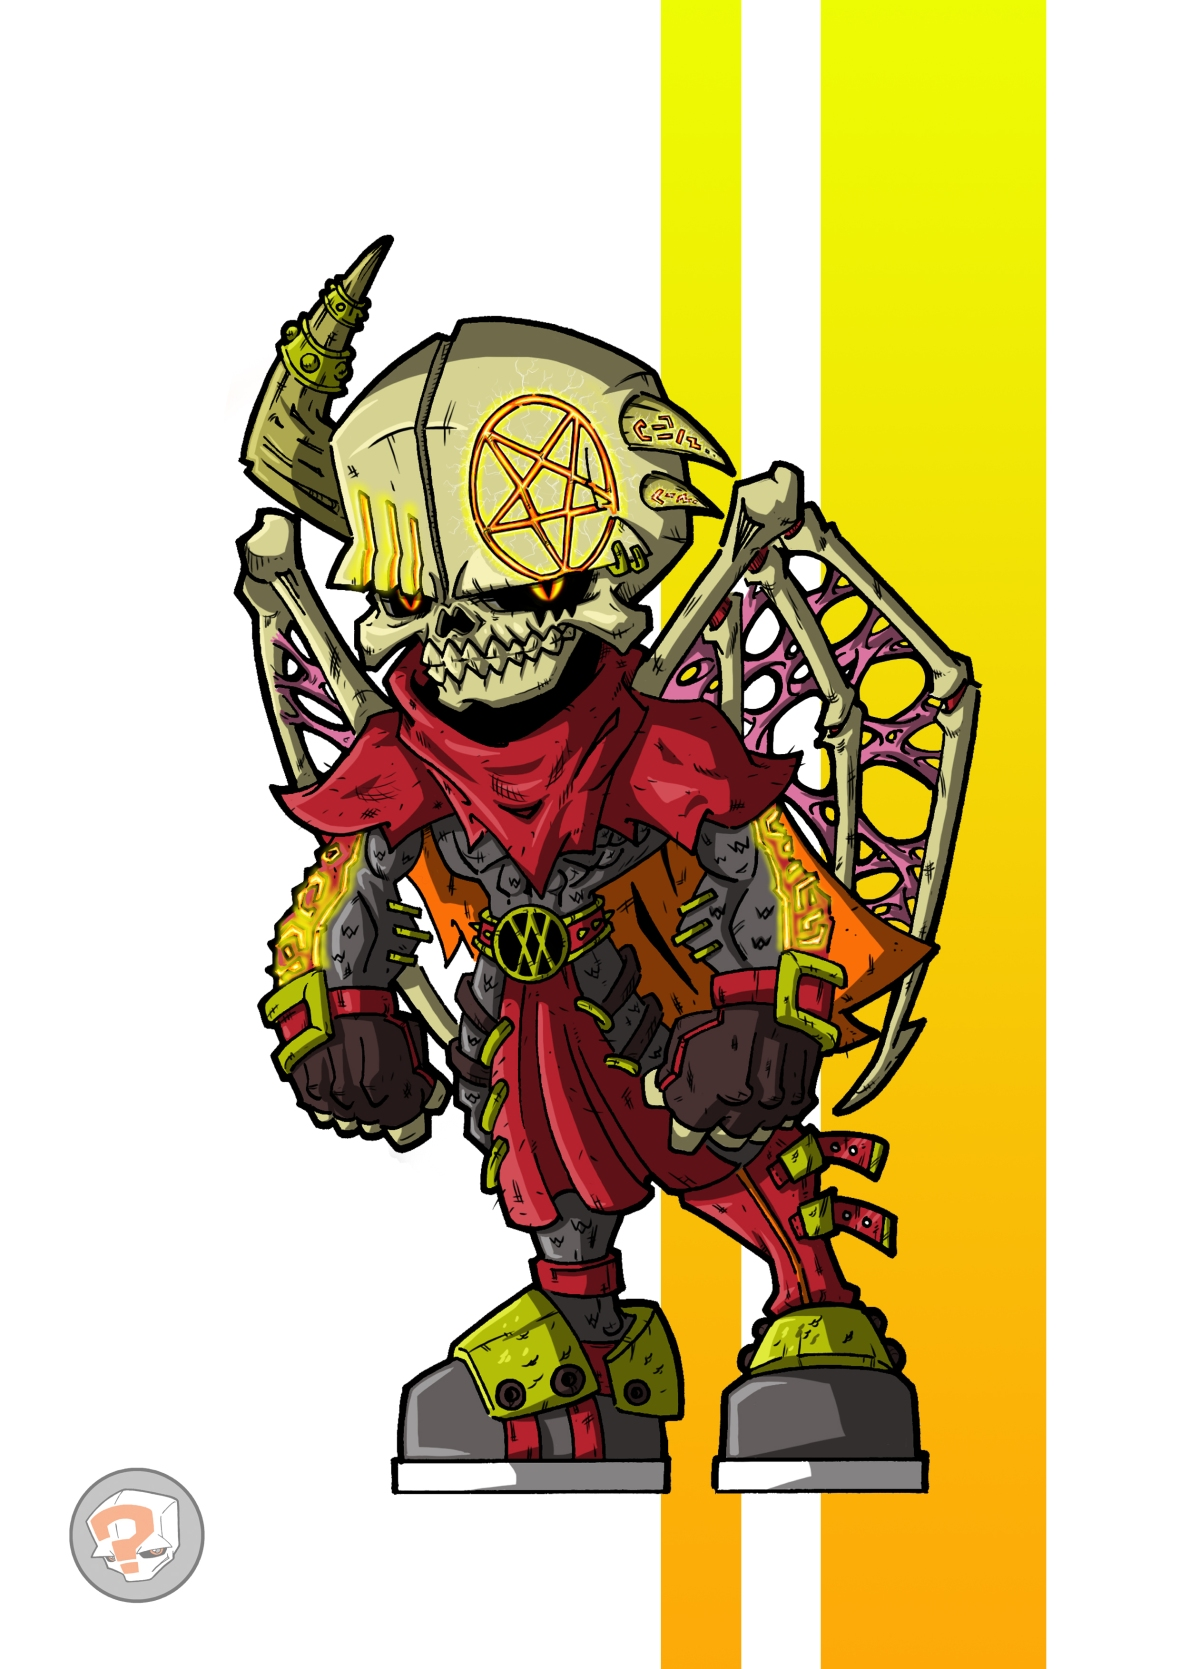 Hells Guardian